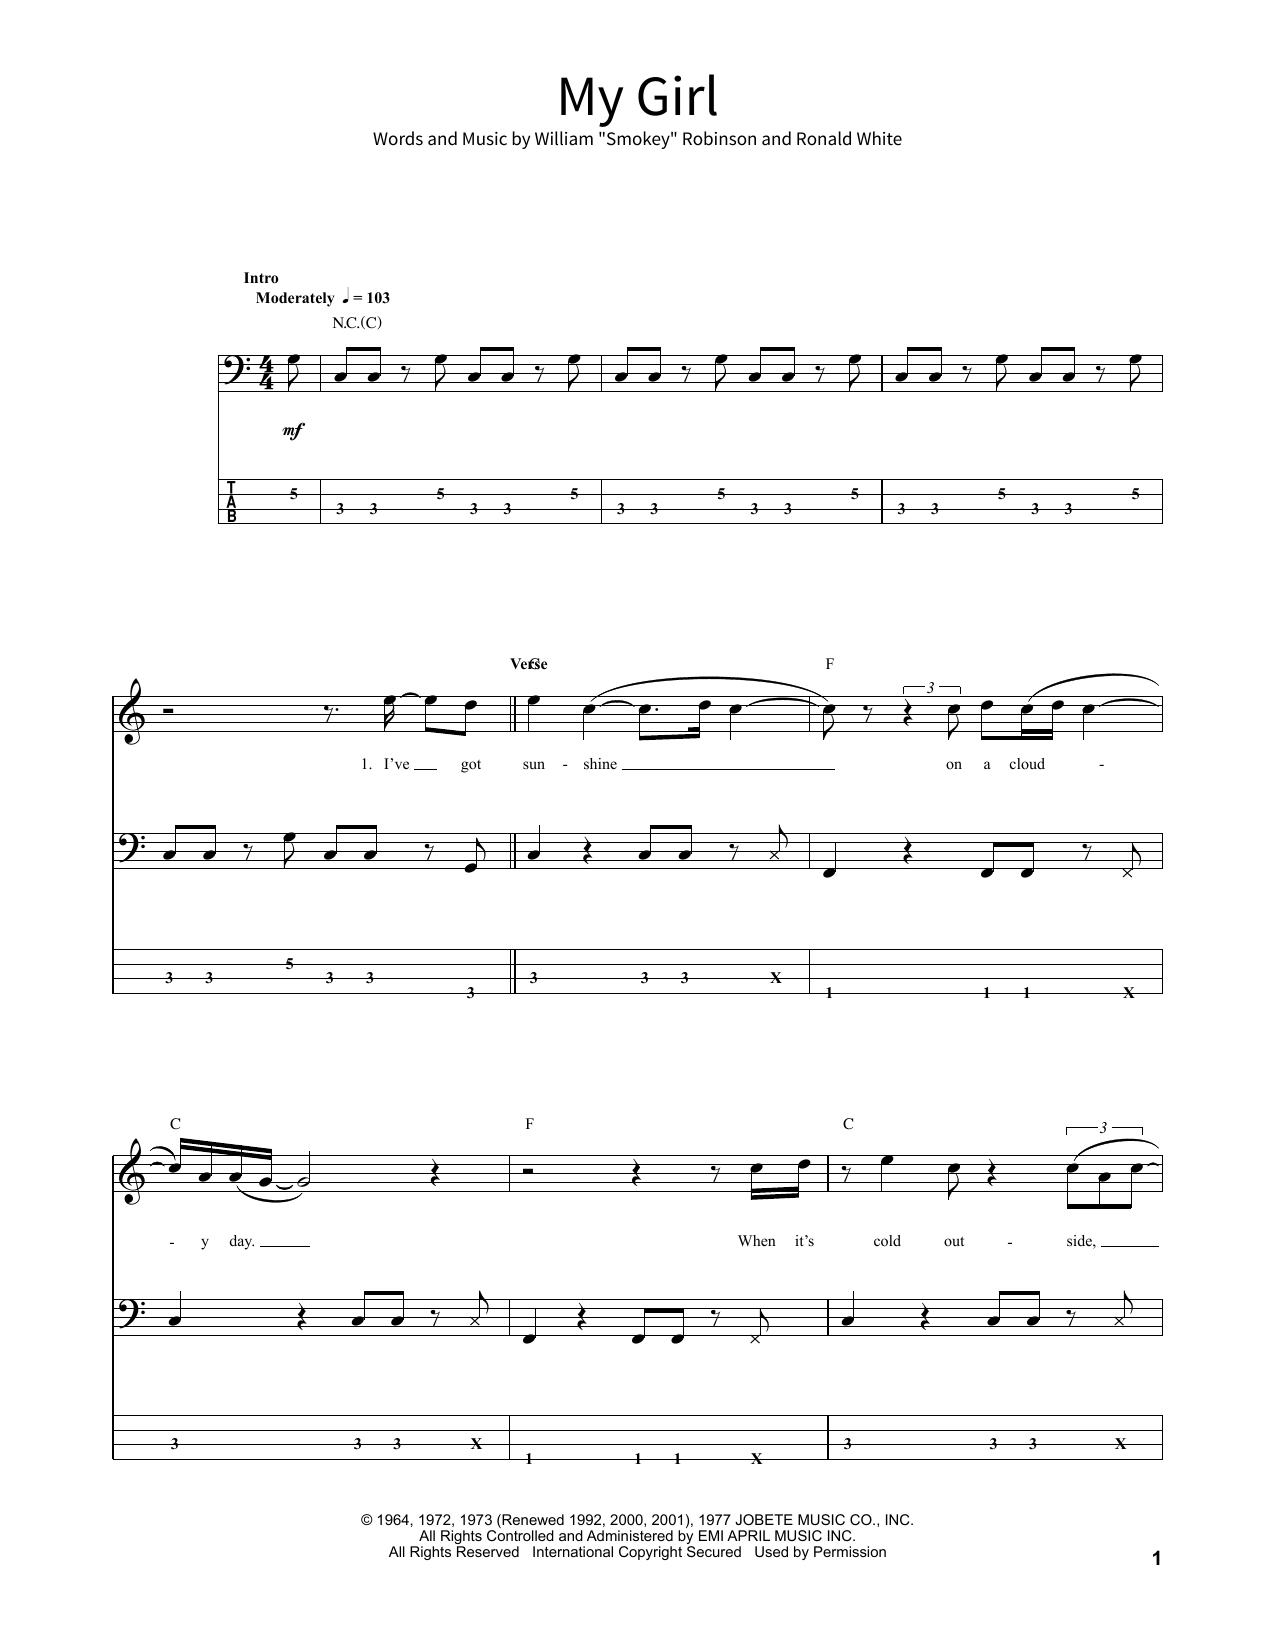 My Girl Sheet Music